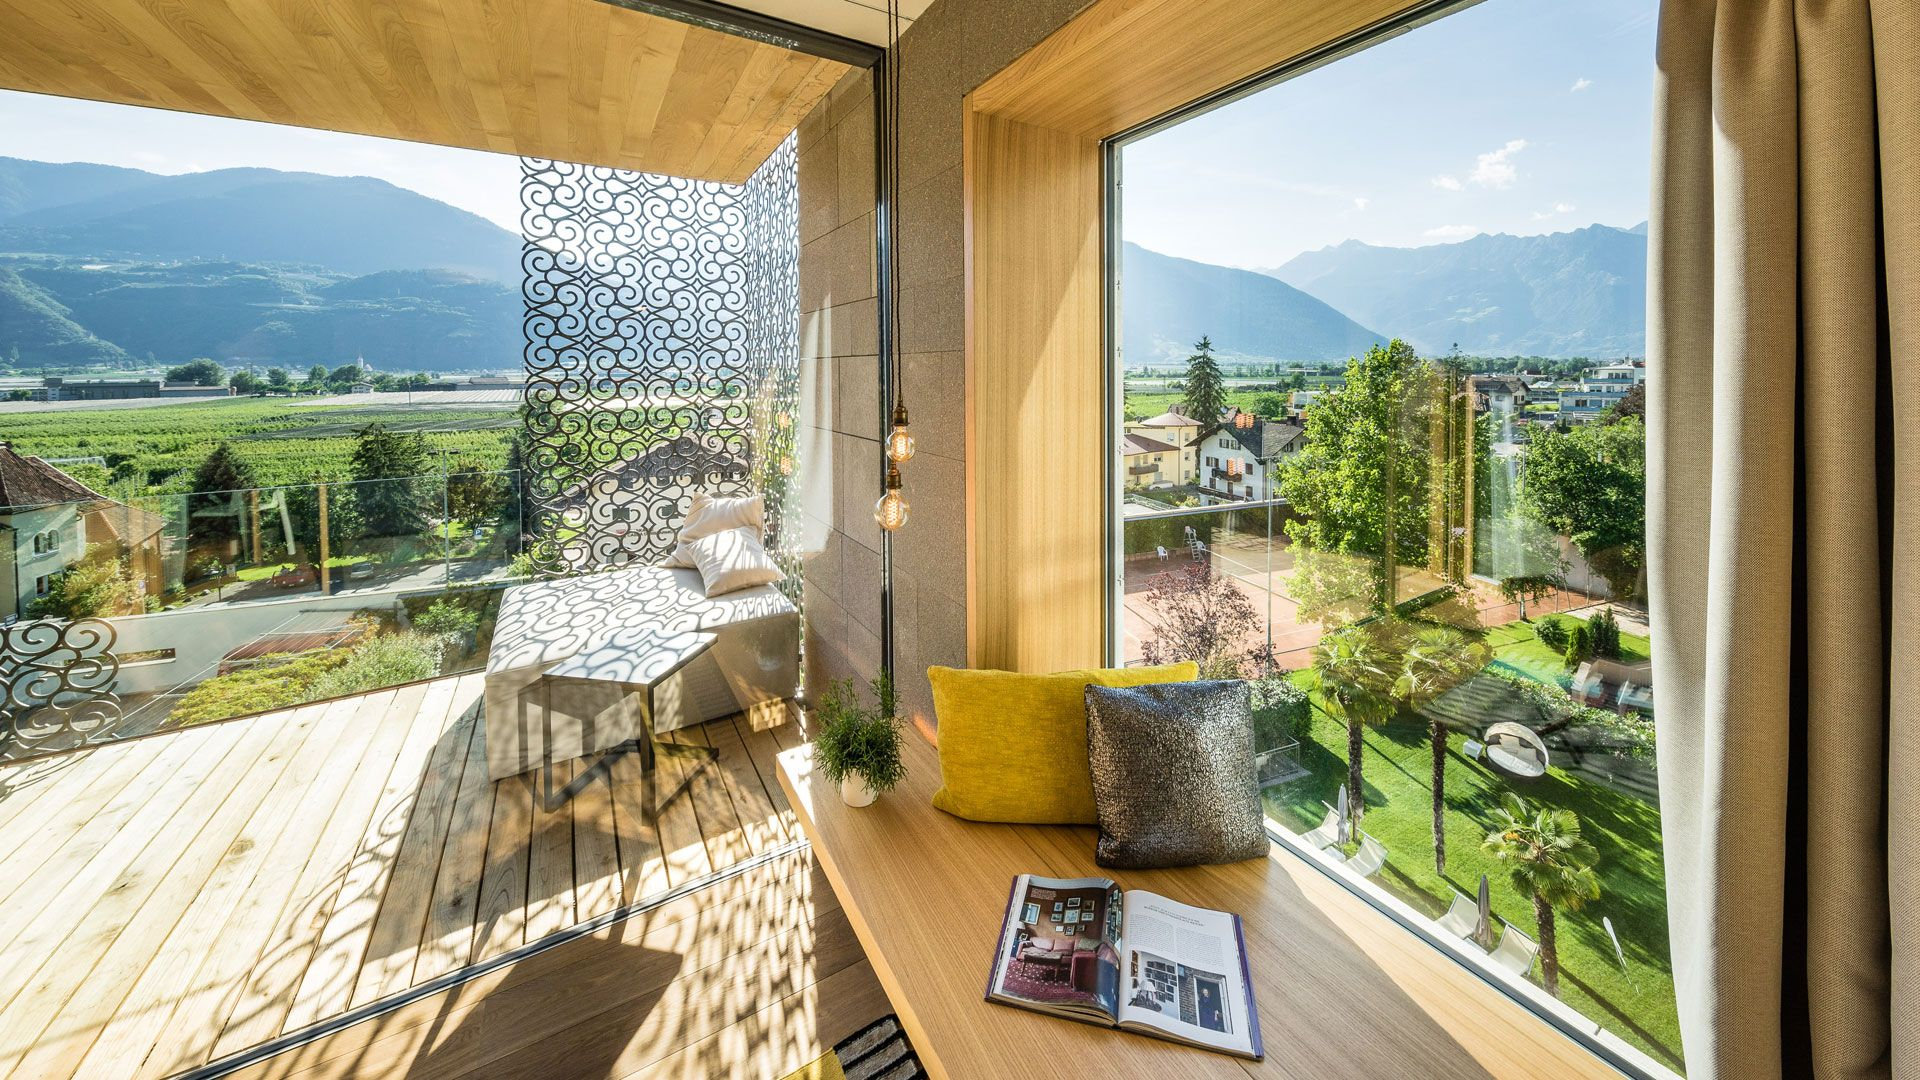 Wellness hotel muchele s dtirol 4 sterne hotels meran for Hotel meran design